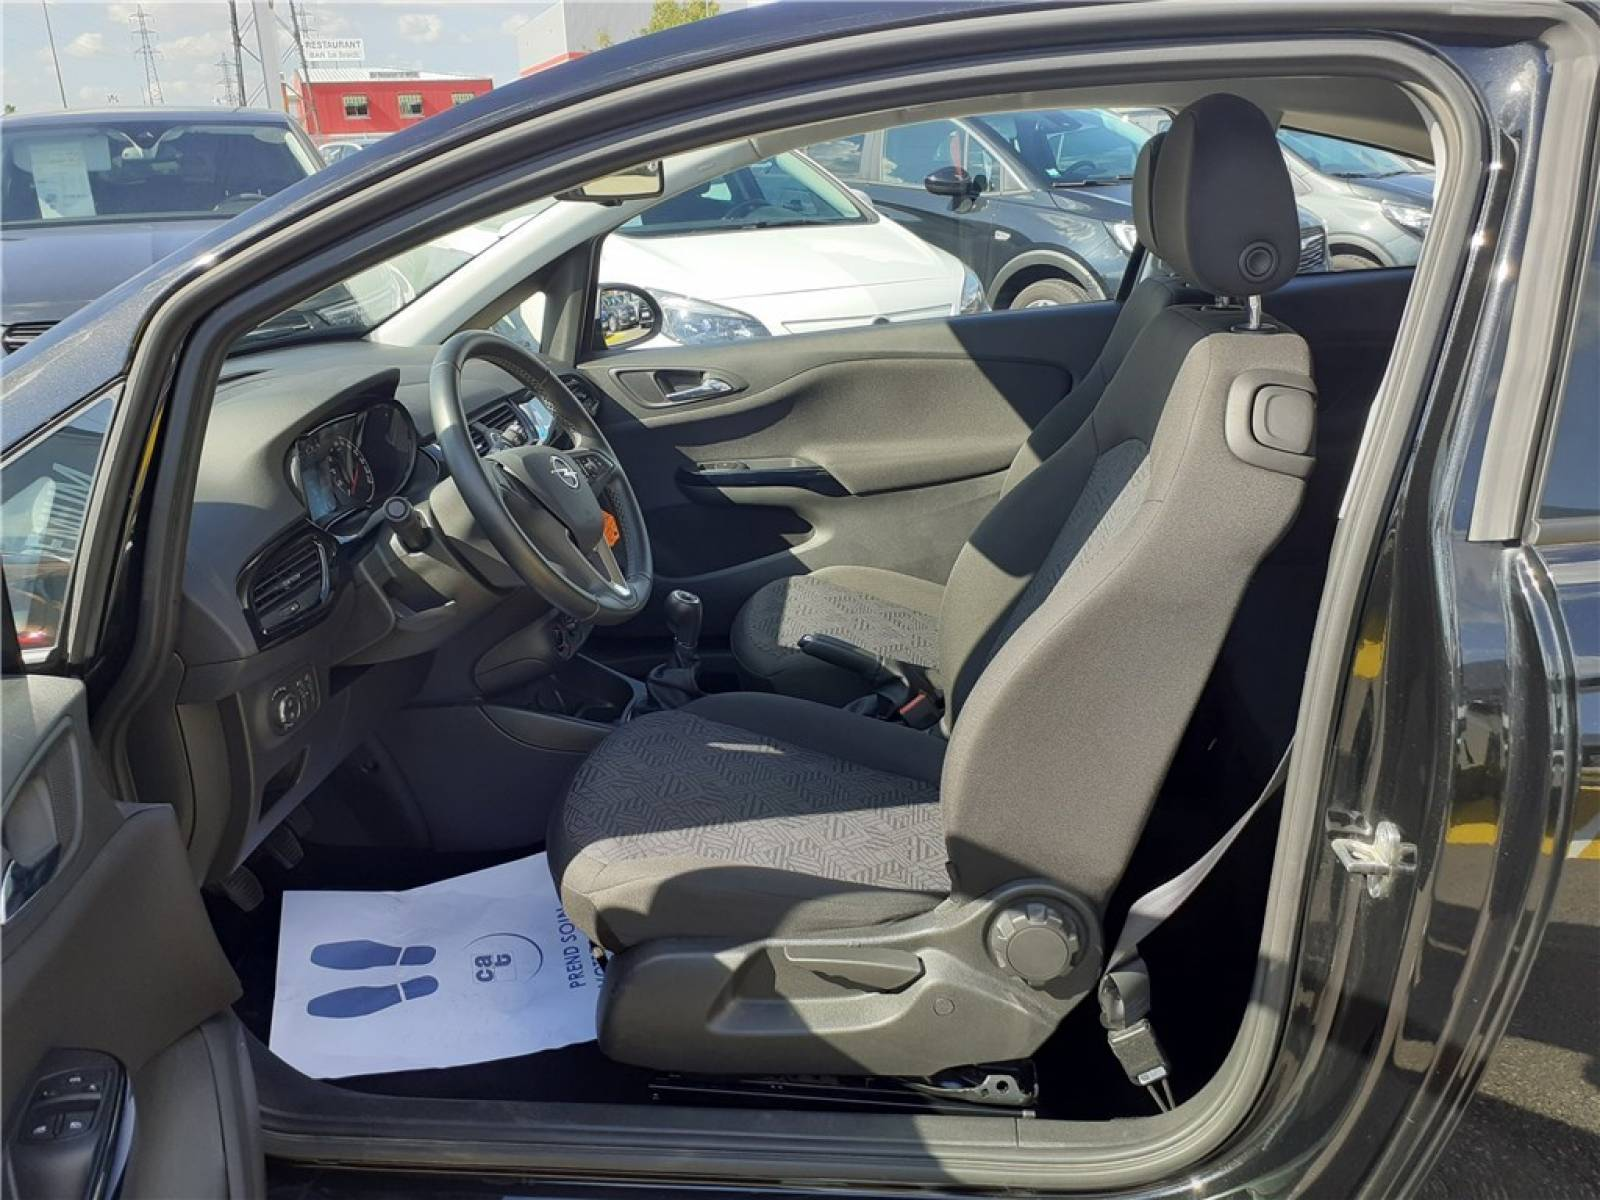 OPEL Corsa 1.4 Turbo 100 ch - véhicule d'occasion - Groupe Guillet - Opel Magicauto - Chalon-sur-Saône - 71380 - Saint-Marcel - 17